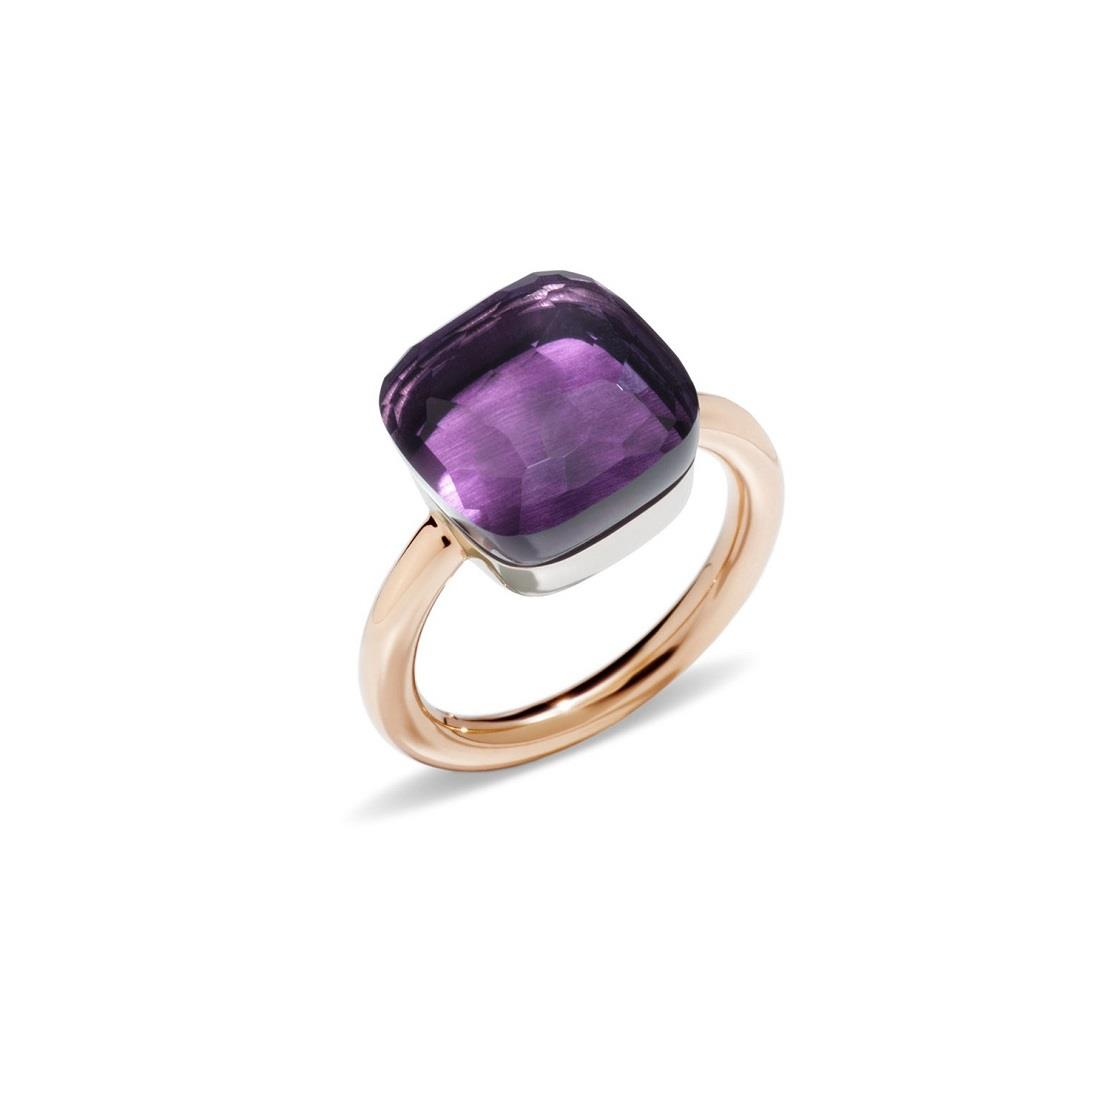 Ring with amethyst - POMELLATO